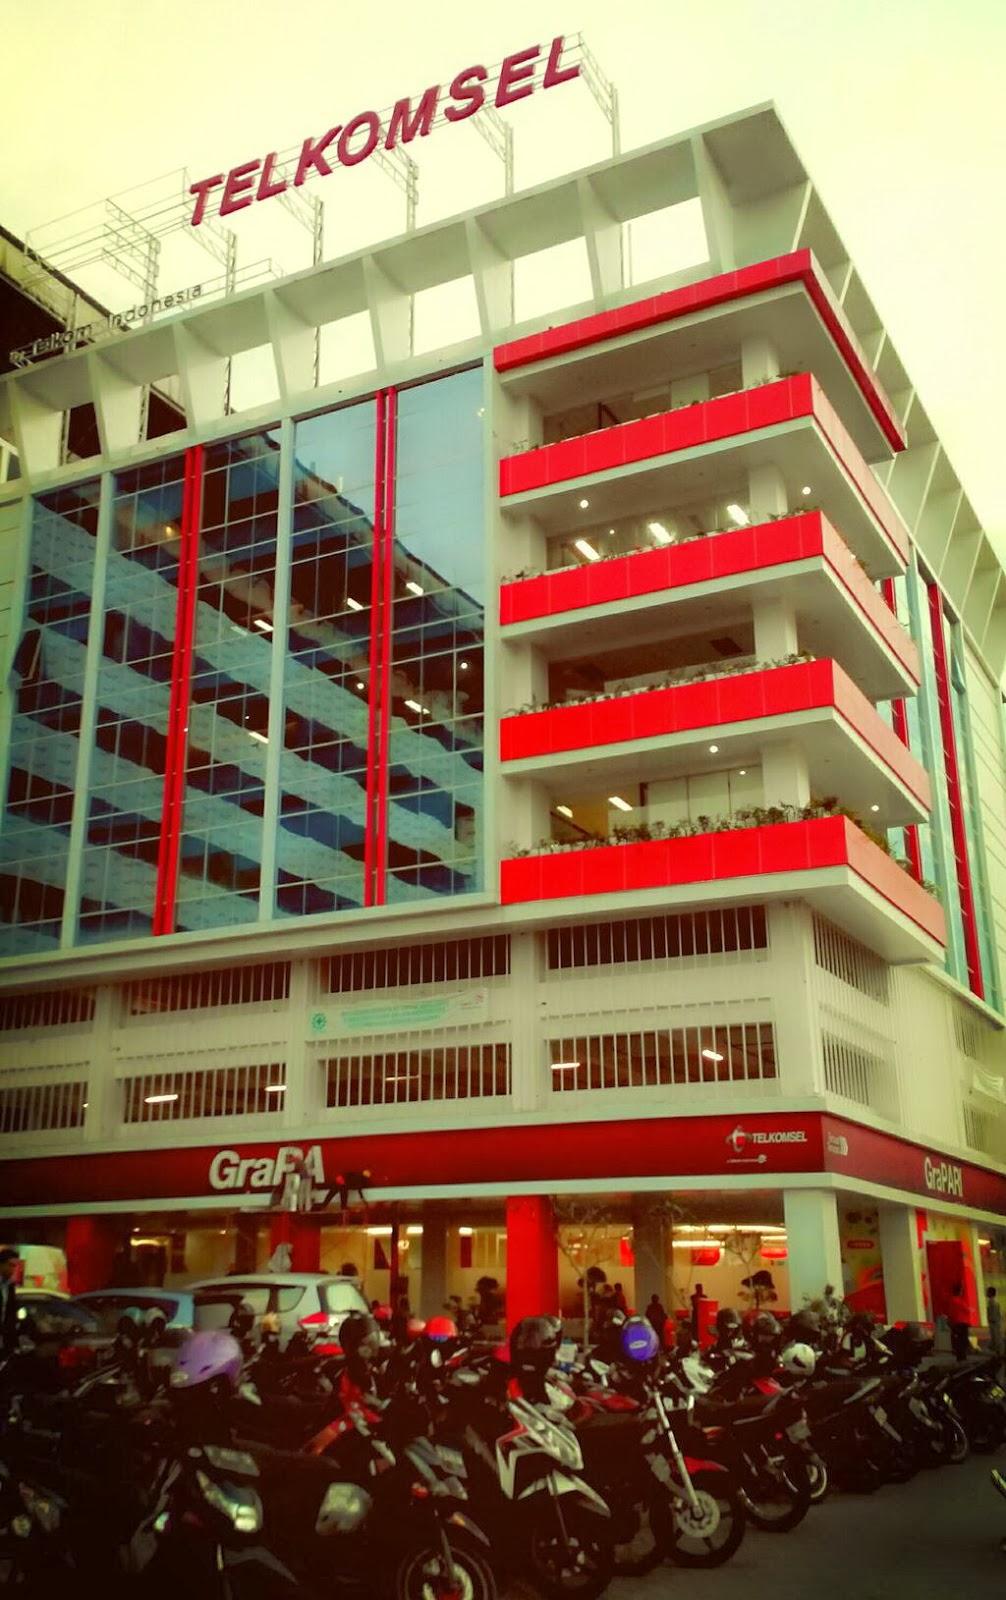 Plasa Telkom Jakarta Pusat : plasa, telkom, jakarta, pusat, Grapari, Telkomsel, Semarang, Pahlawan, Seputar